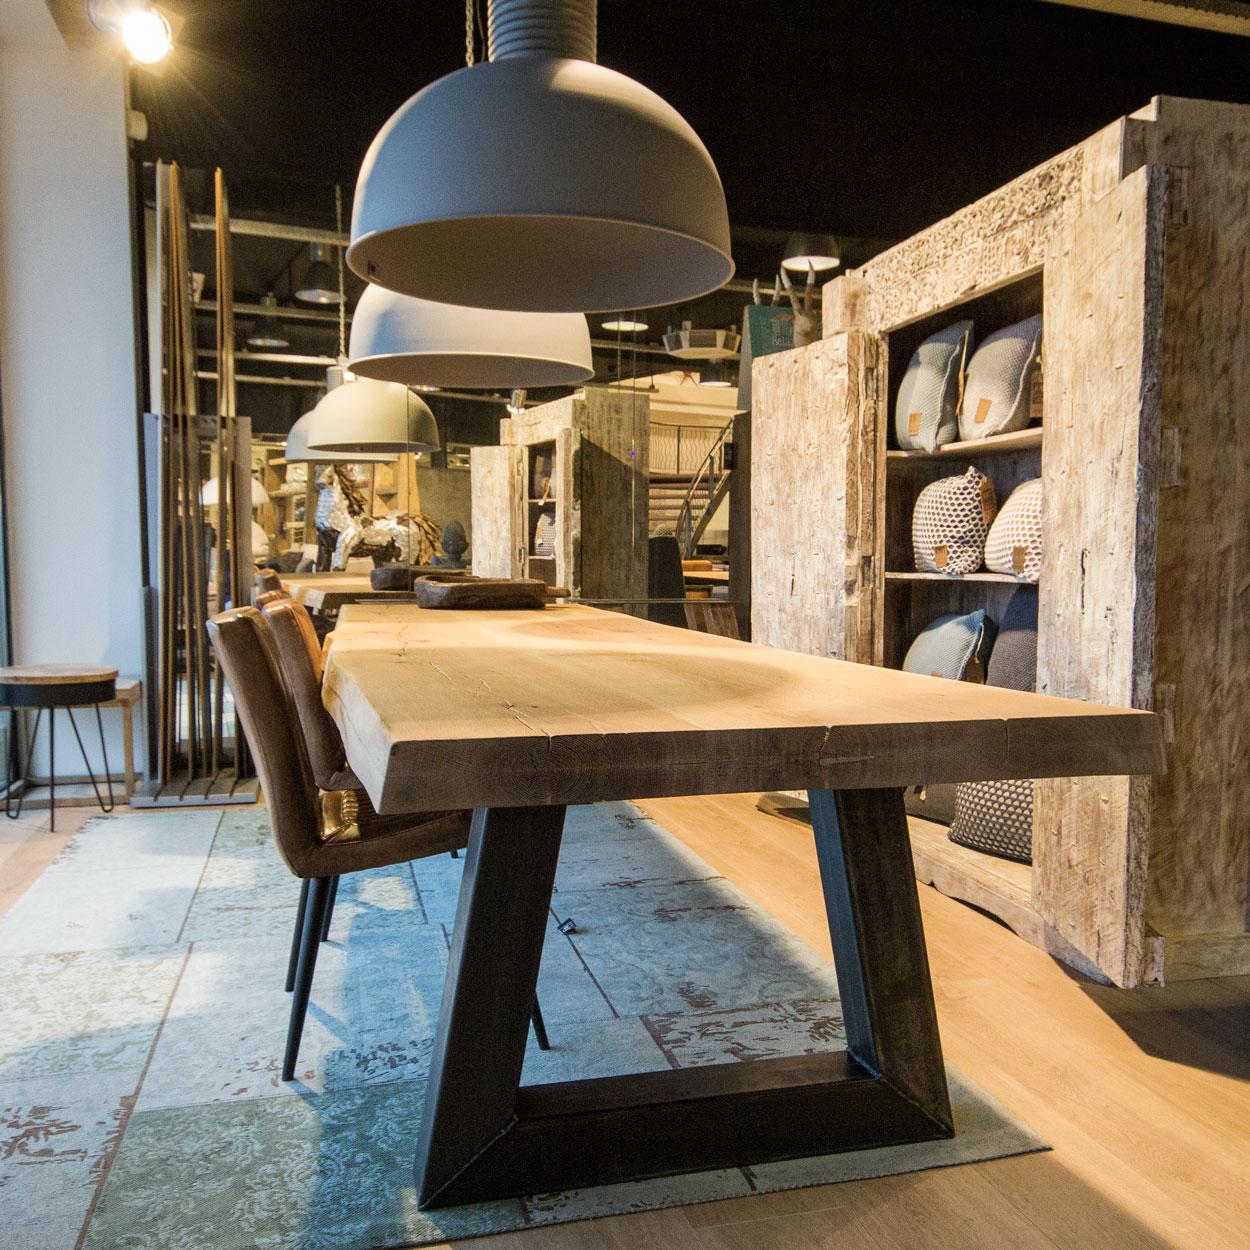 Interieur stoer en industrieel wonen stijlvol styling for Interieur inspiratie